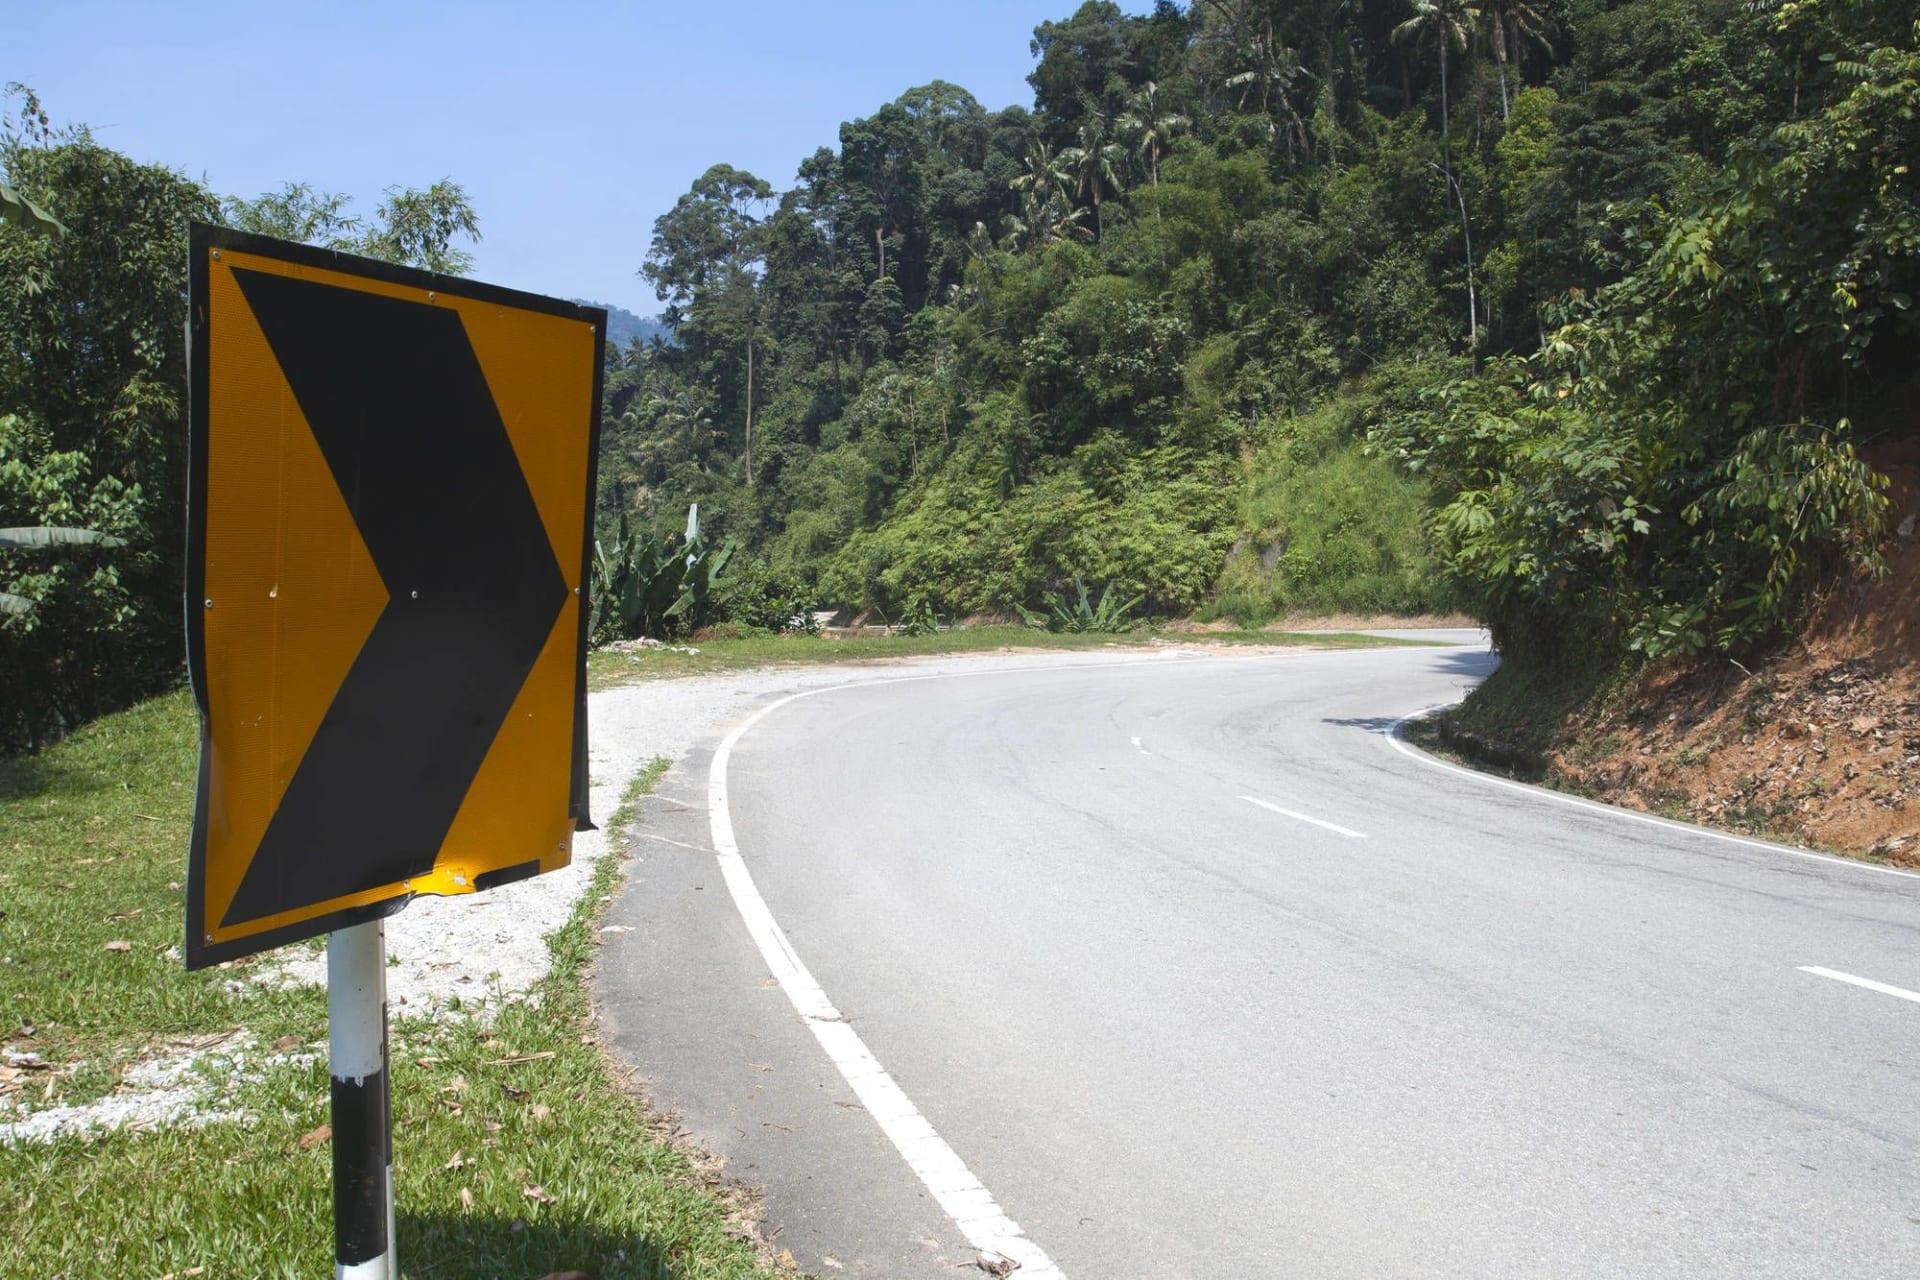 Malaysia Cameron Highlands Road Sign